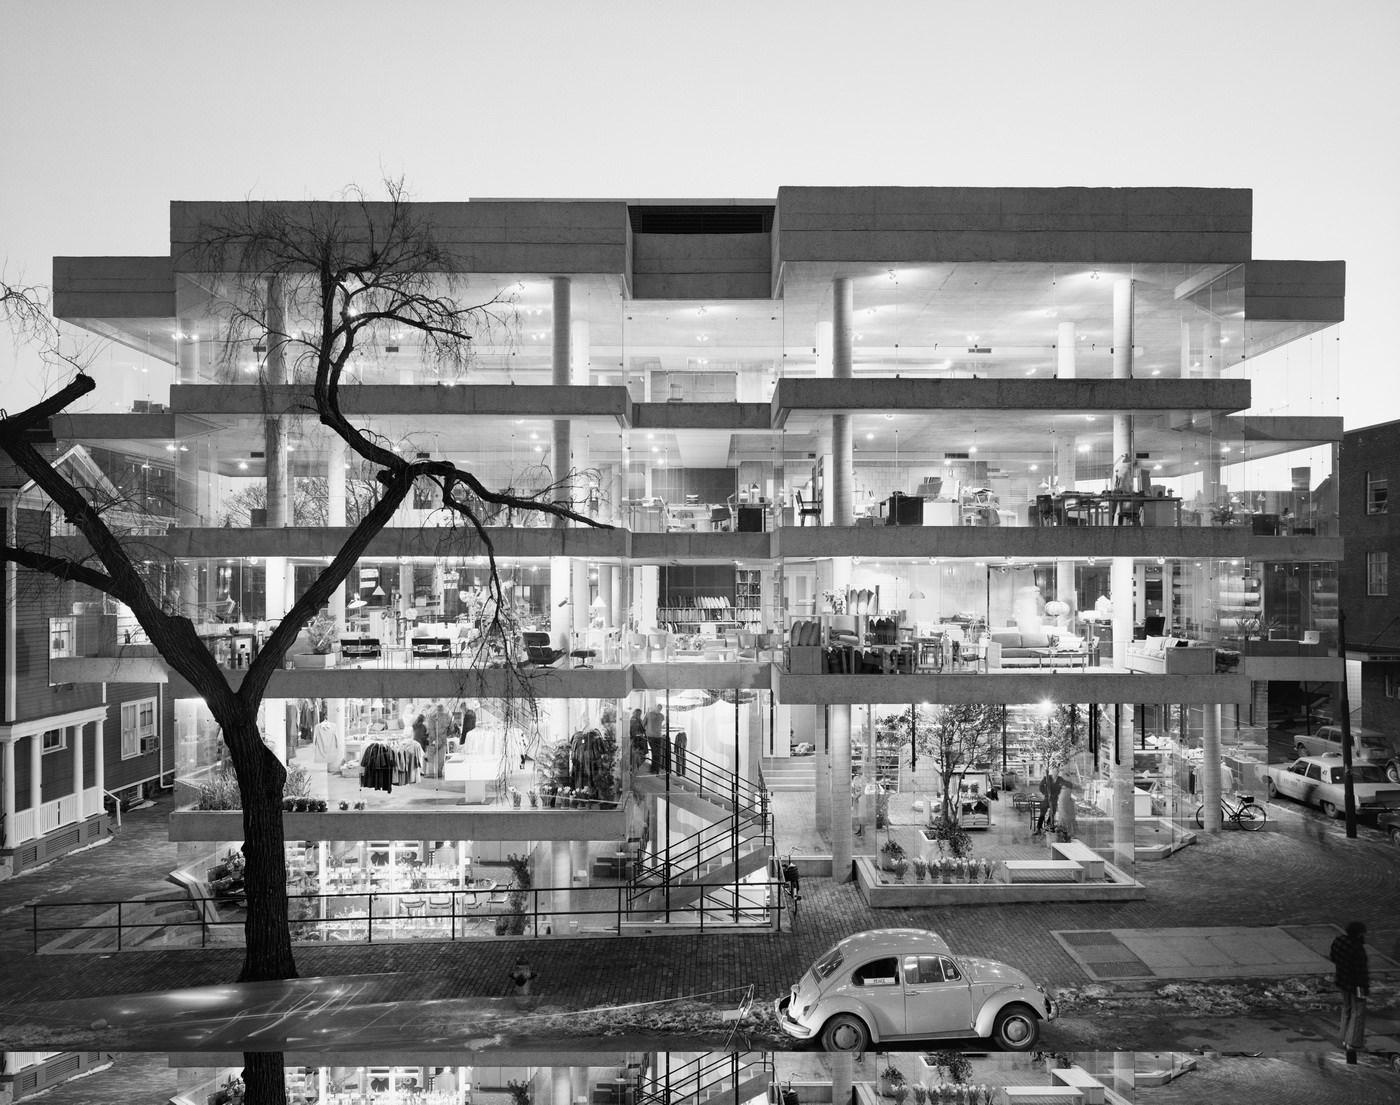 Эзра Столлер. Магазин «Дизайн Рисёрч». Арх.: Бенджамин Томпсон. Кембридж, шт. Массачусетс, 1970